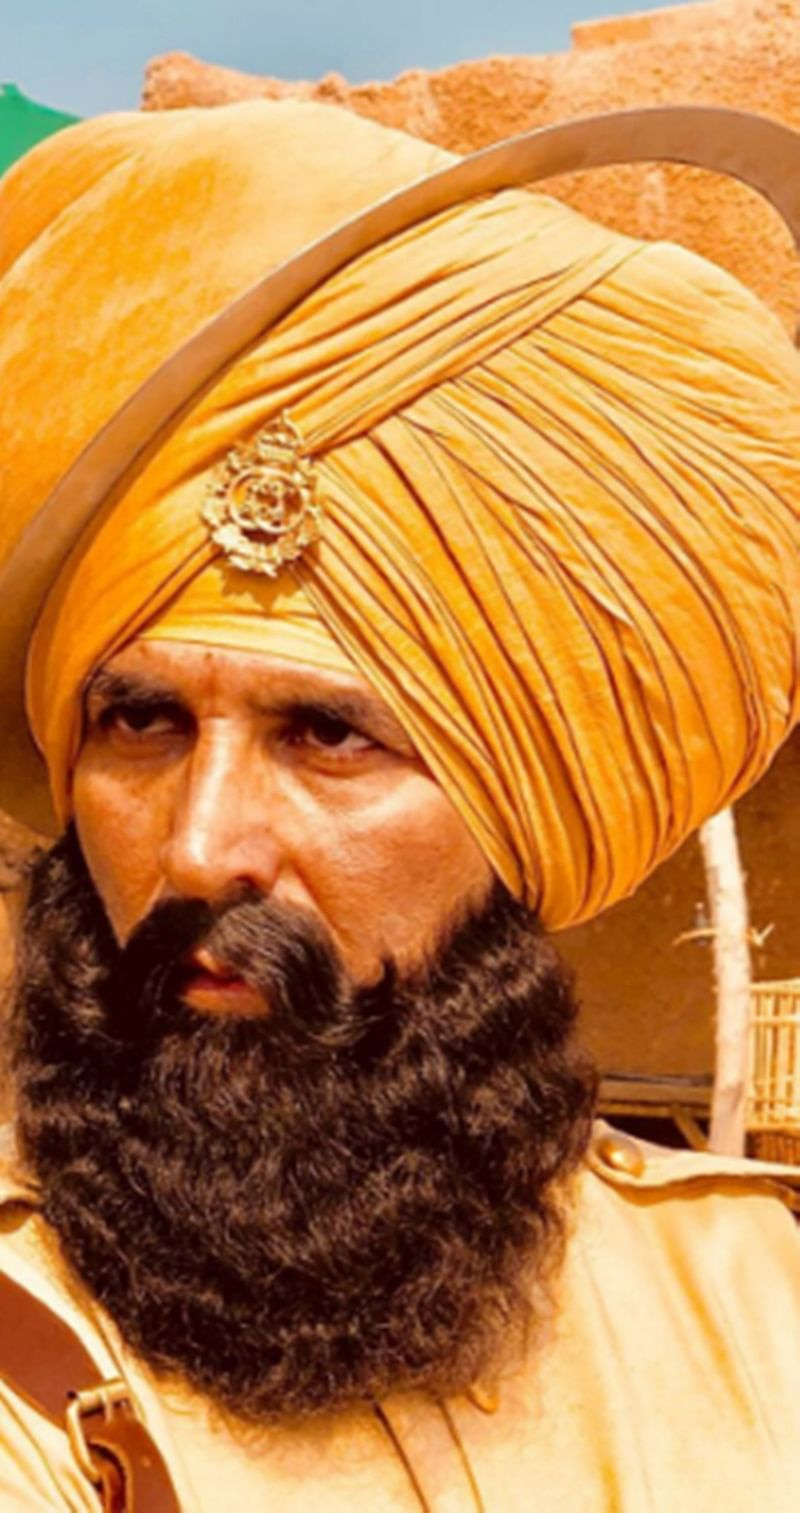 Akshay Kumar's 'Kesari' to release on March 21